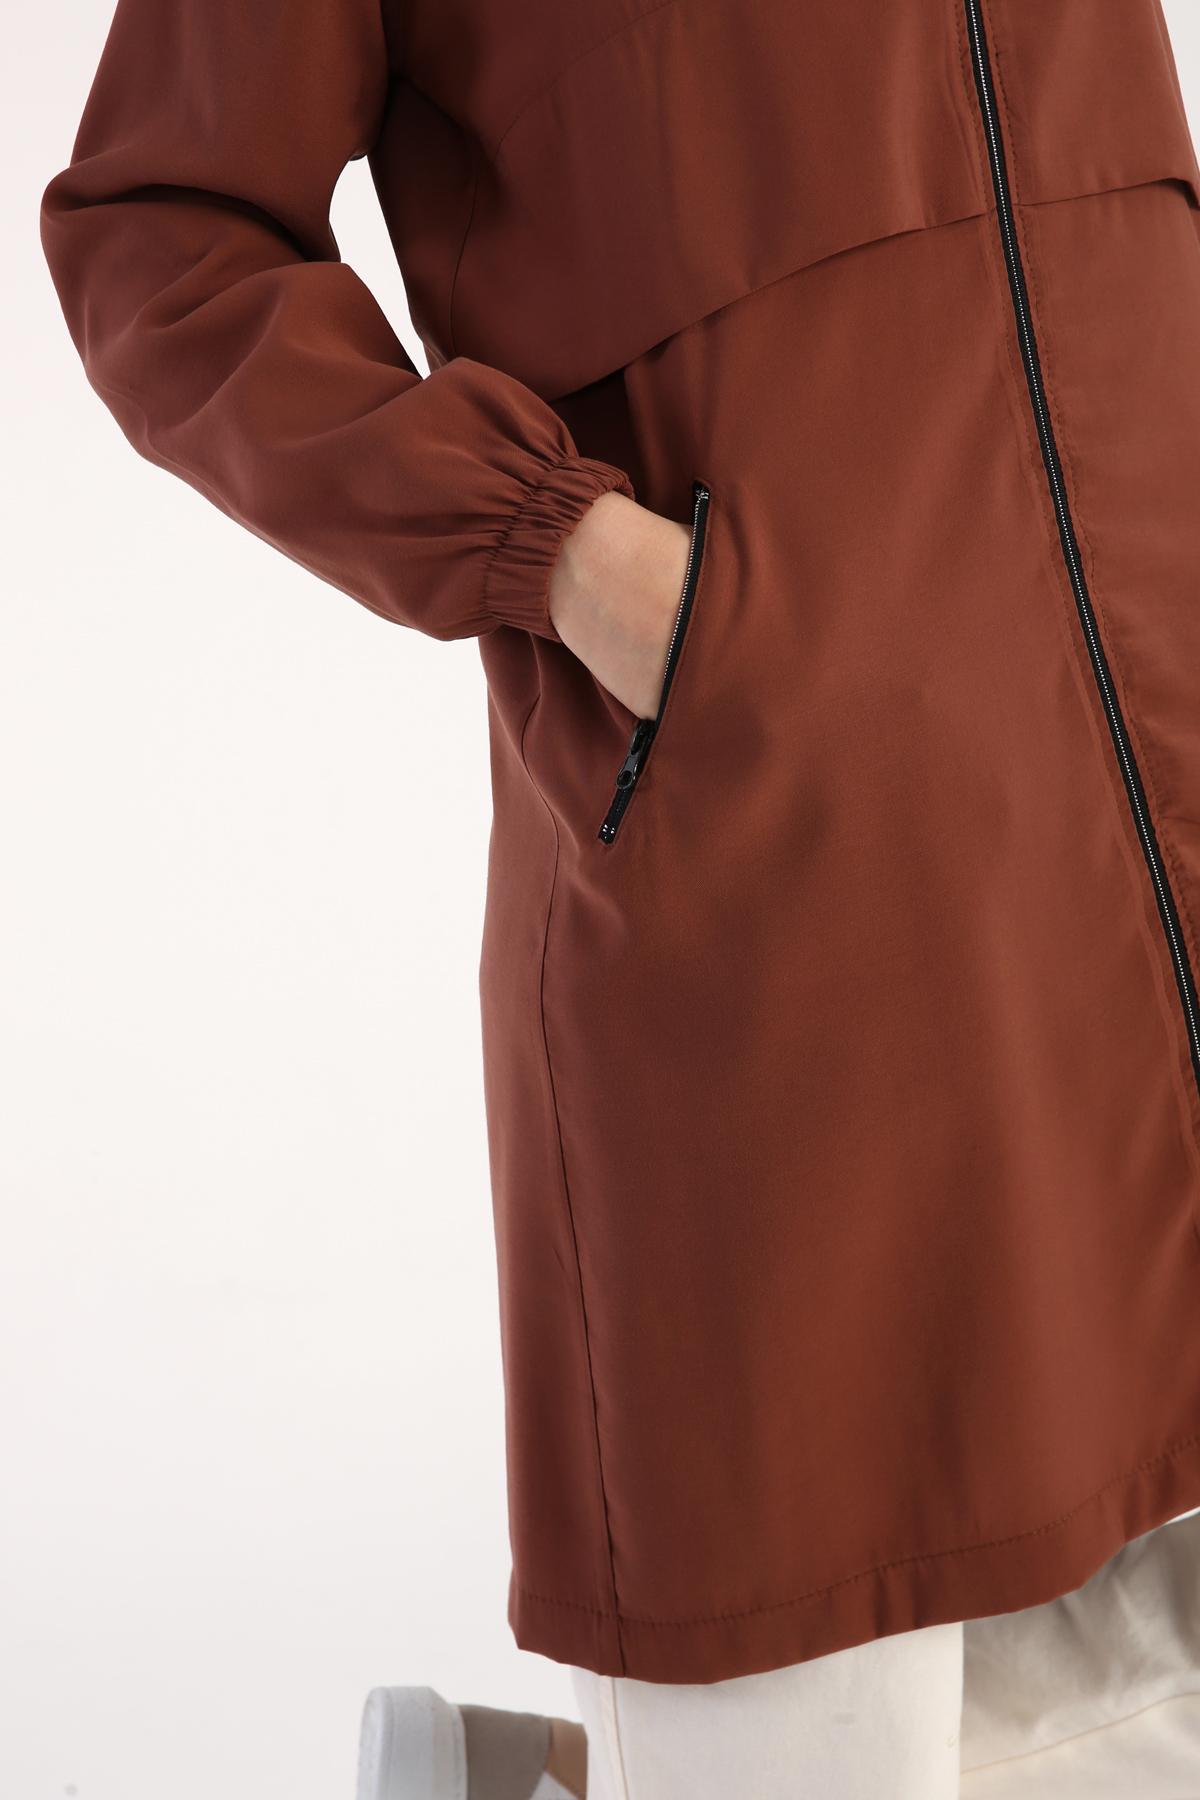 Raglan Sleeve Hooded Cape